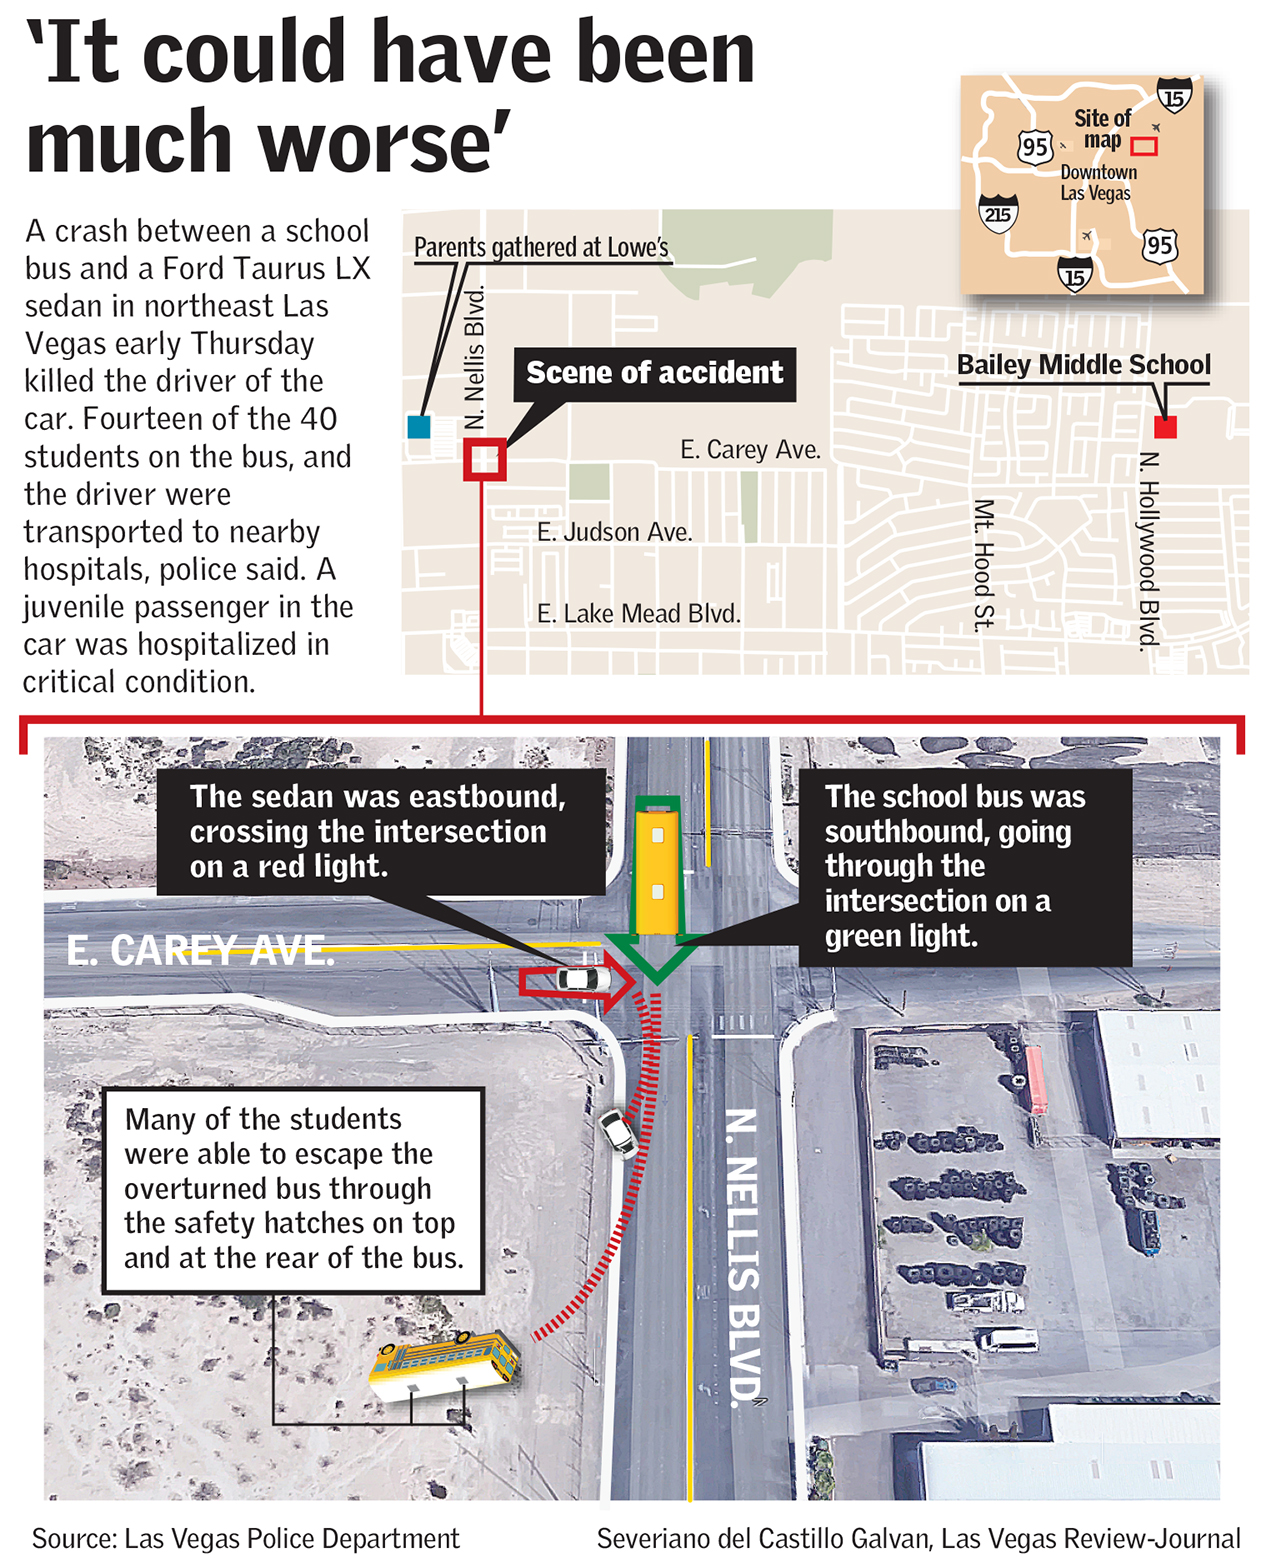 ccsd bus crash (Las Vegas Review-Journal)